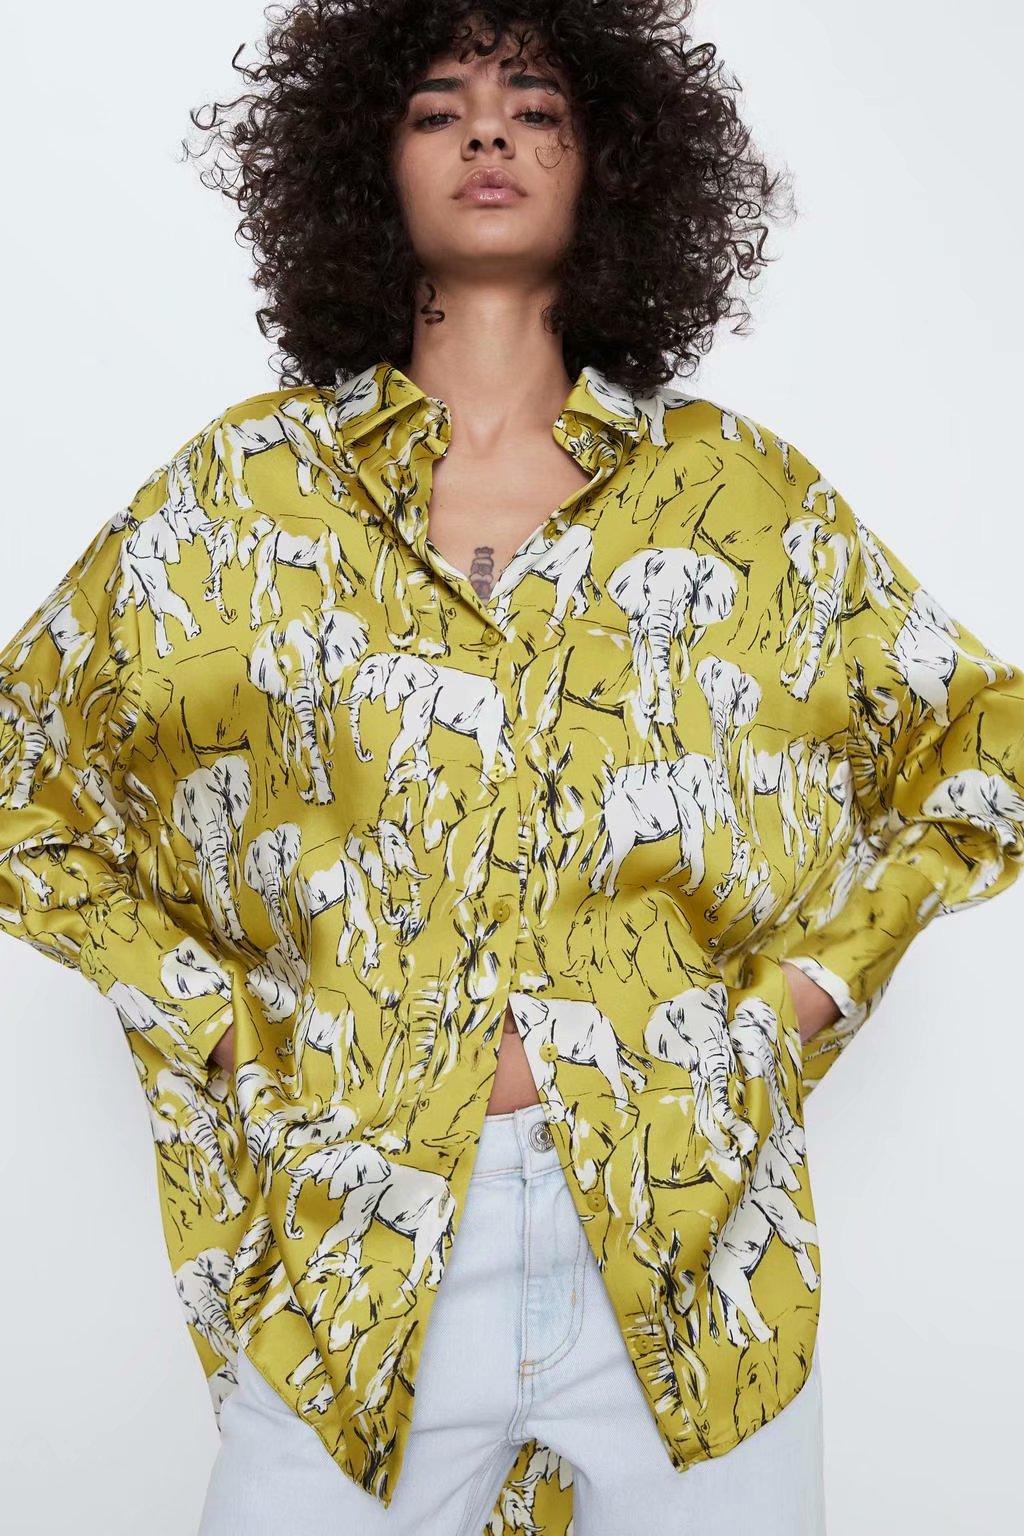 2020 New Spring Summer European Elephant Print Female Shirt Zaraing Vadiming Sheining Women's Yellow Printings Shirt XDN9427